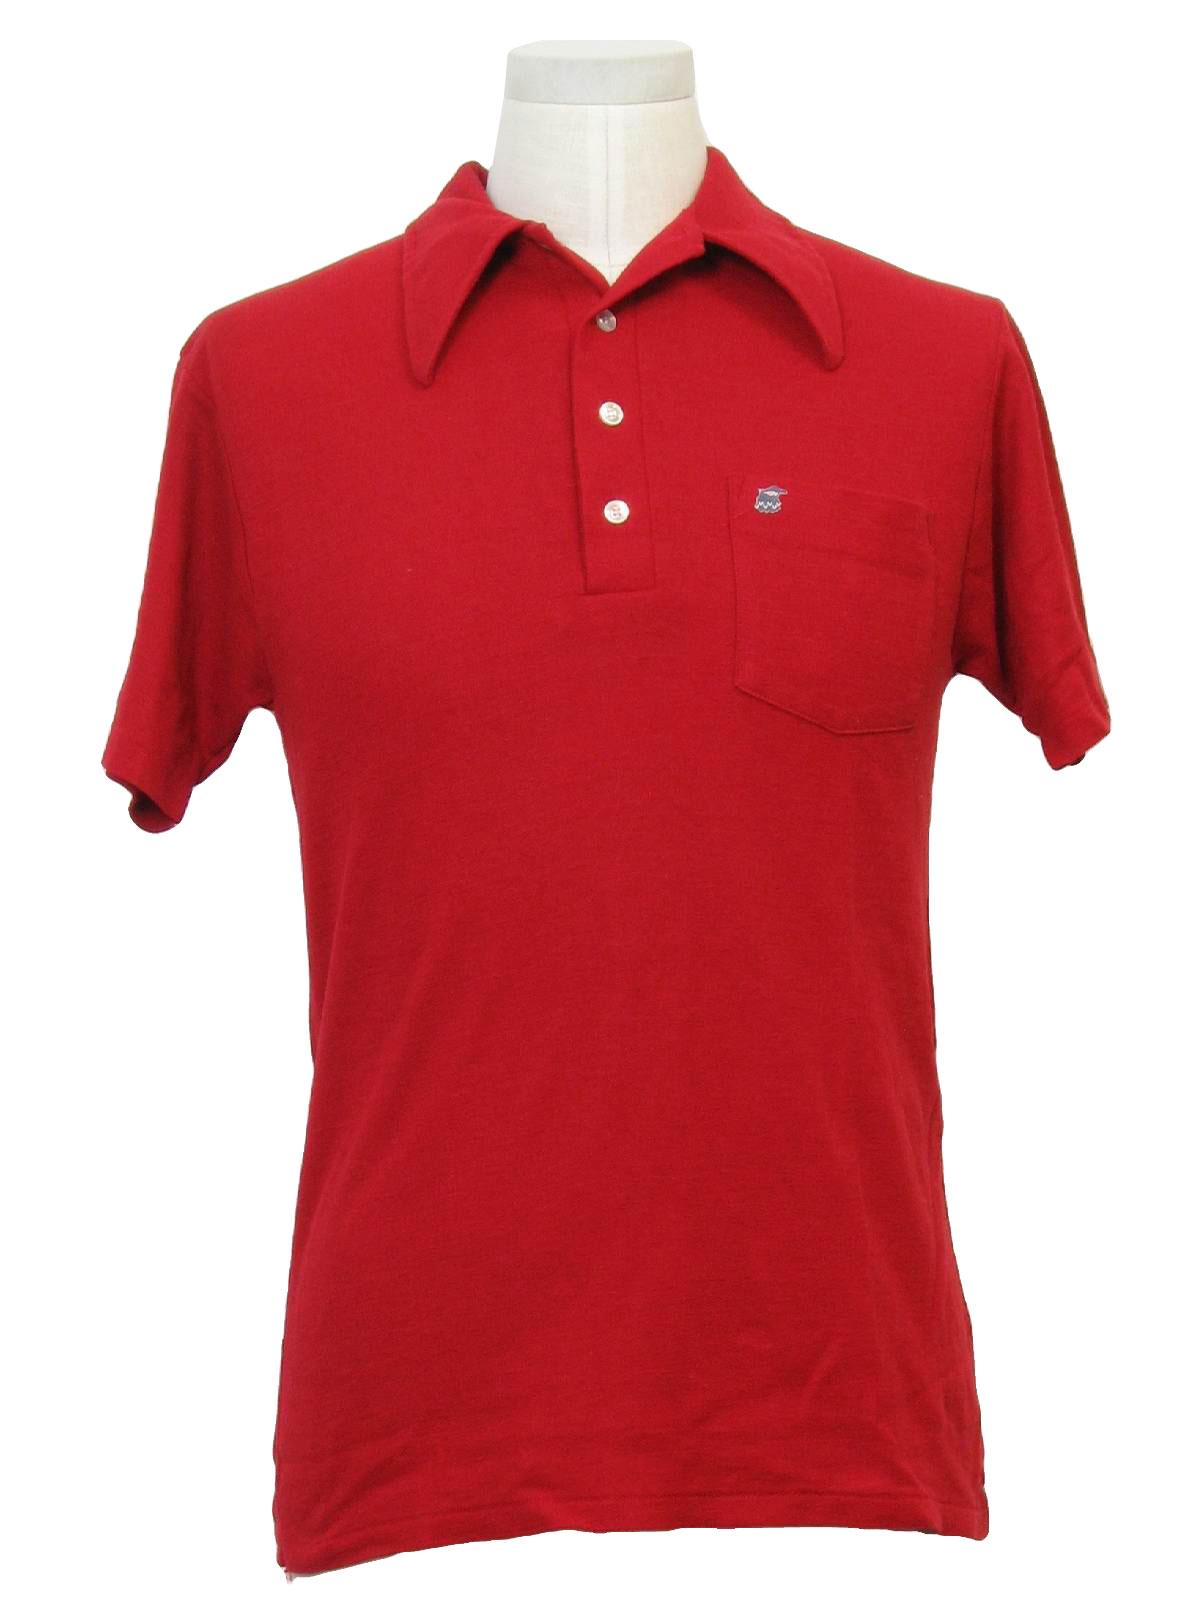 70s vintage kmart shirt 70s kmart mens red polyester for Kmart button up shirts